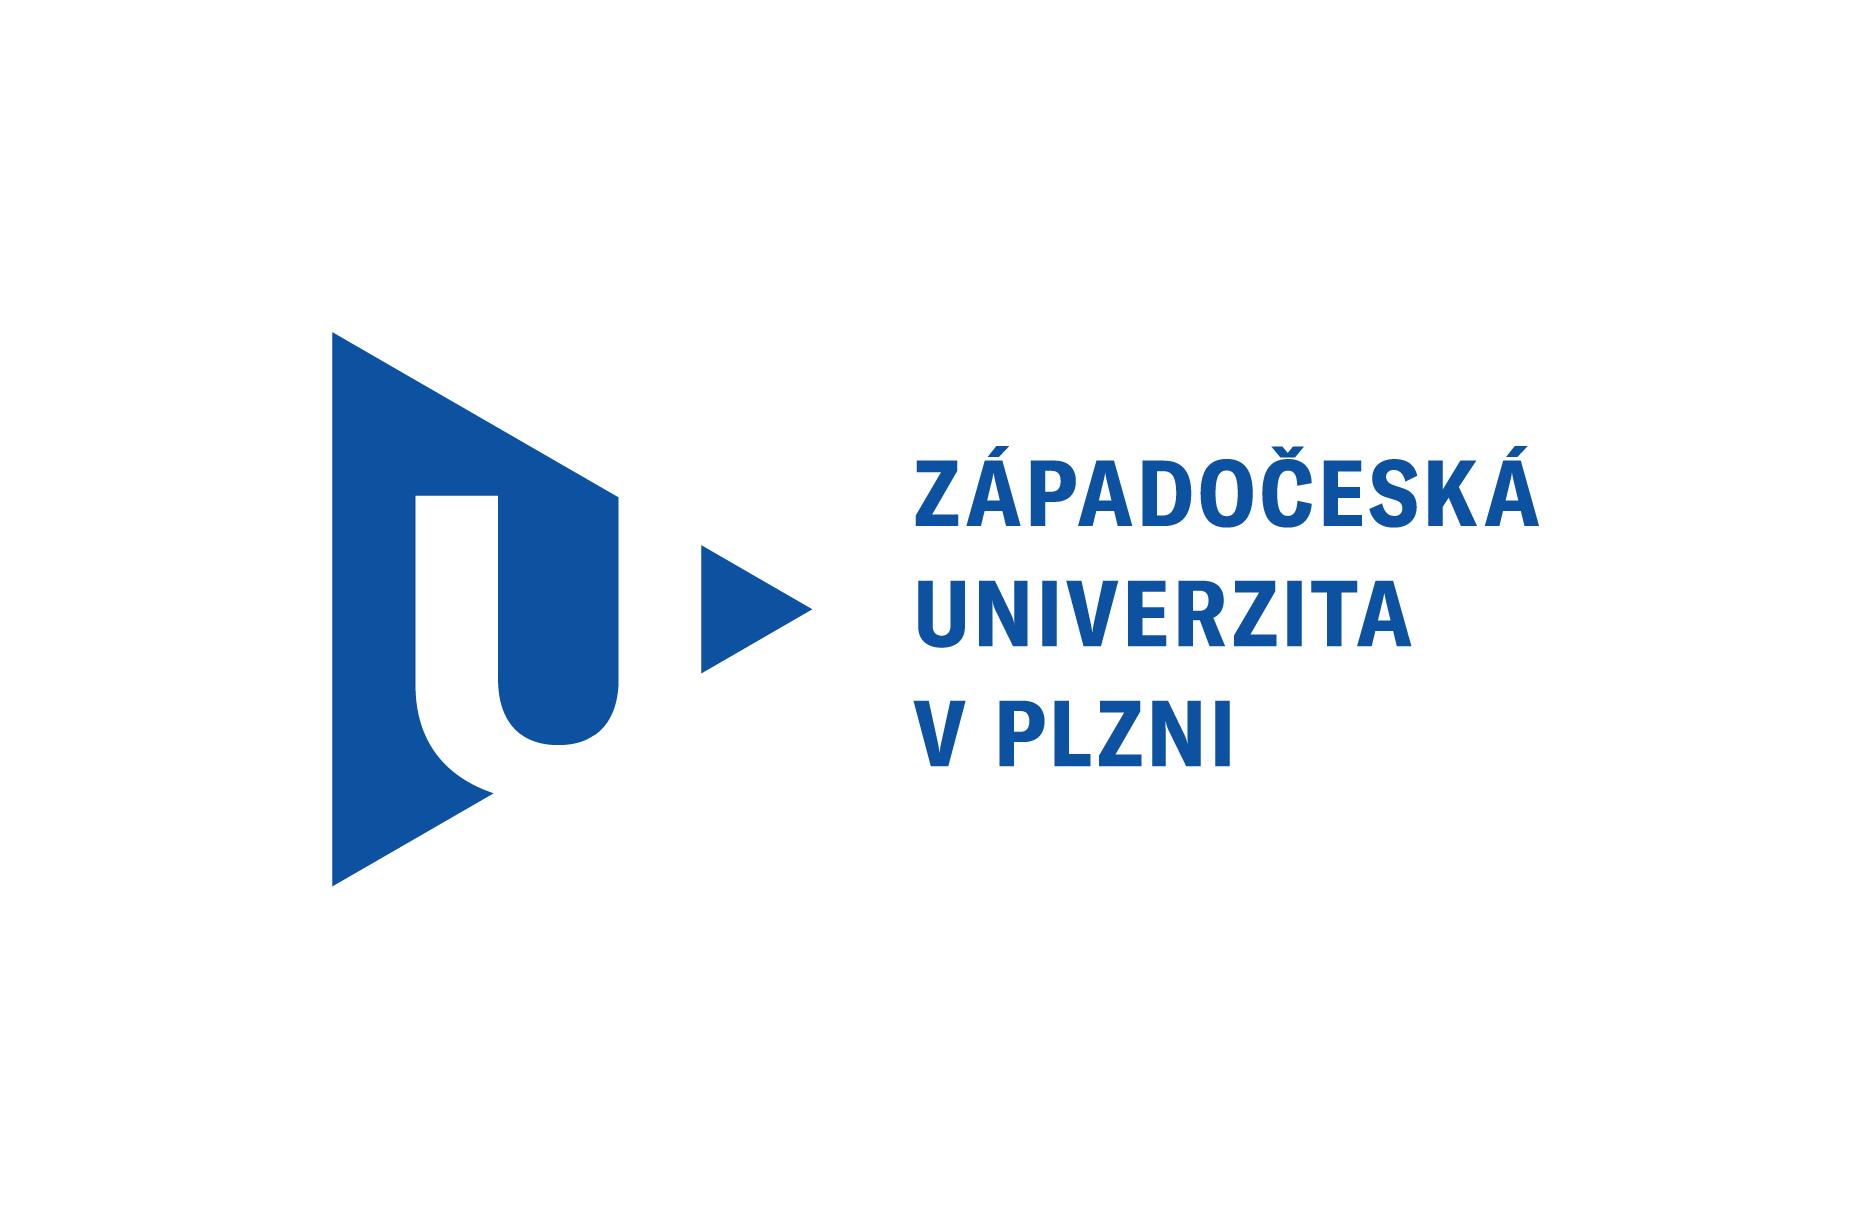 zcu logo